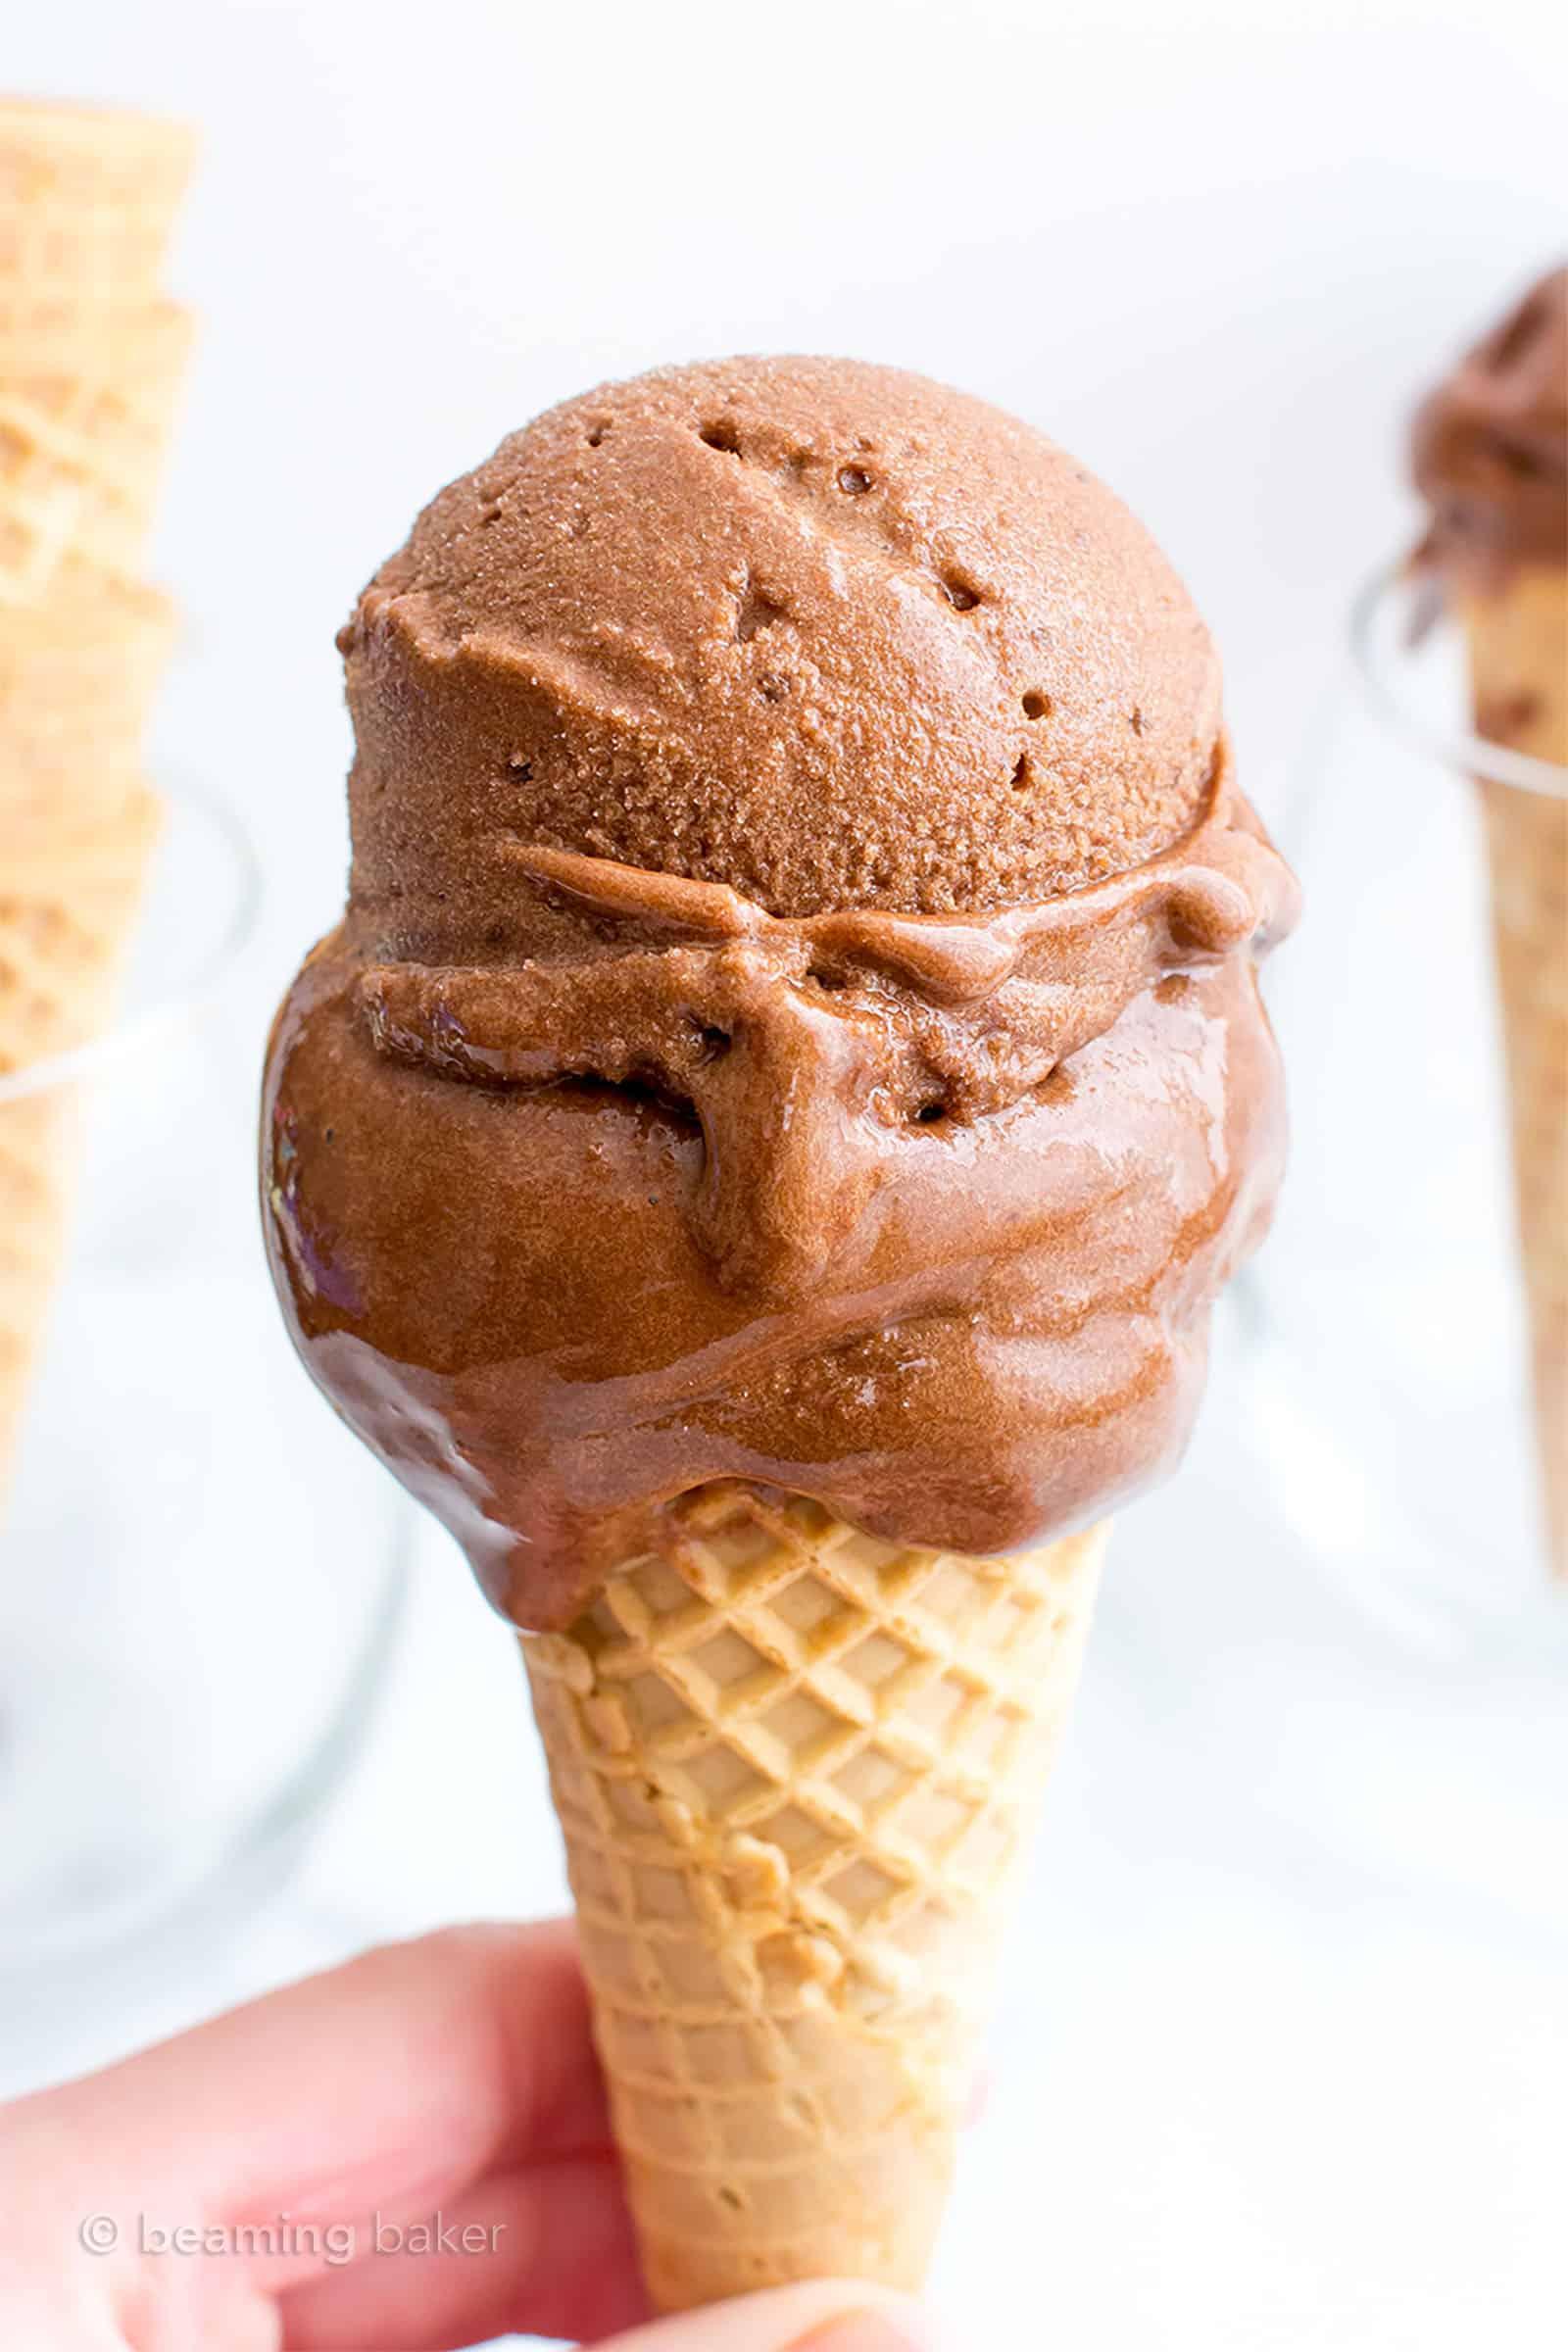 Dark Chocolate Nice Cream Recipe: my favorite nice cream recipe—rich 'n creamy chocolate nice cream, made with just 4 simple, whole ingredients. #NiceCream #Vegan #IceCream #Banana | Recipe at BeamingBaker.com